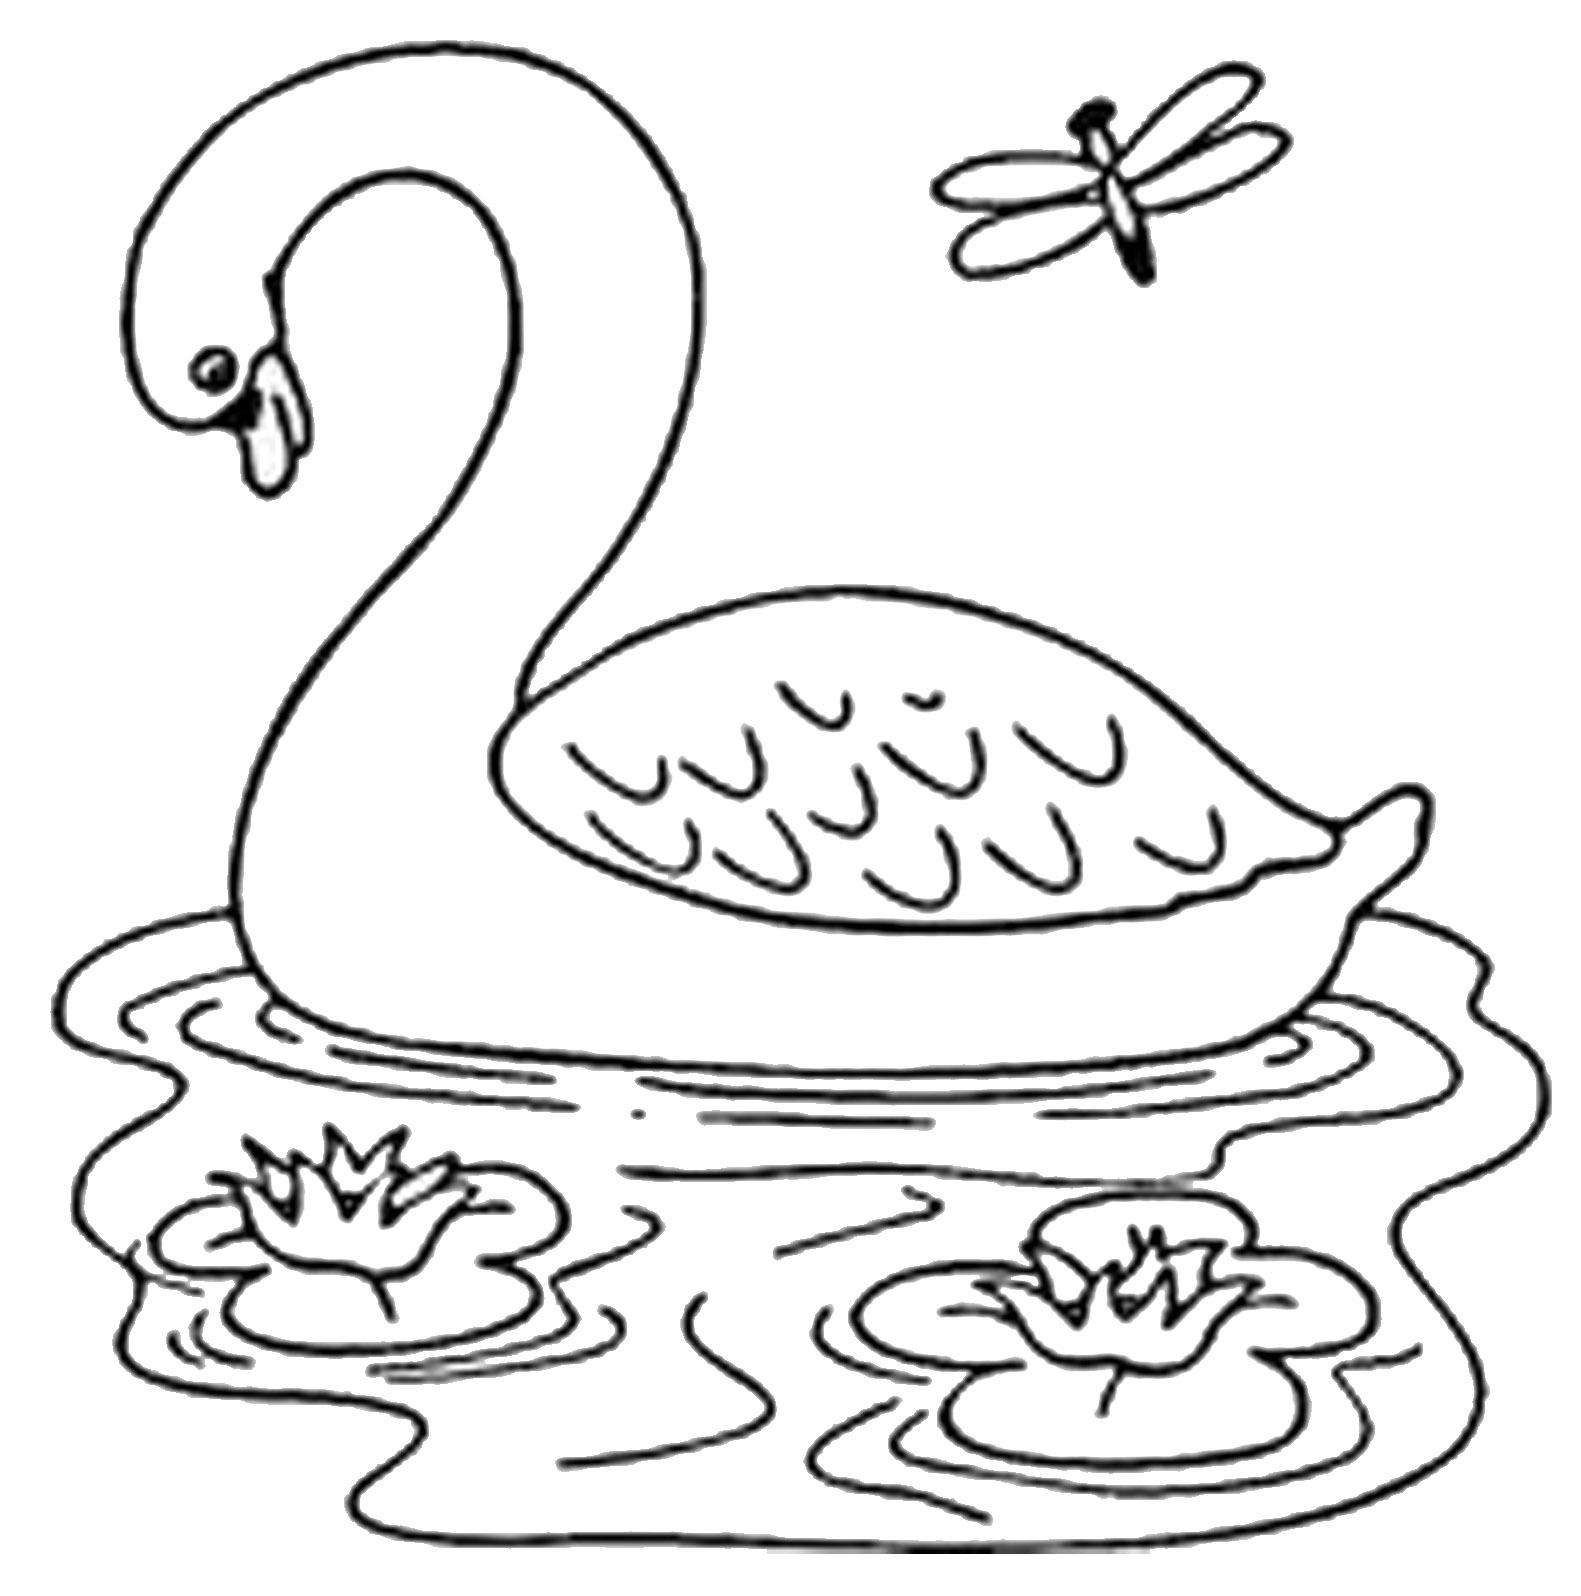 Gambar Mewarnai Jerapah Lucu Kaligrafi Kartun Hewan Diwarnai Buah Apel